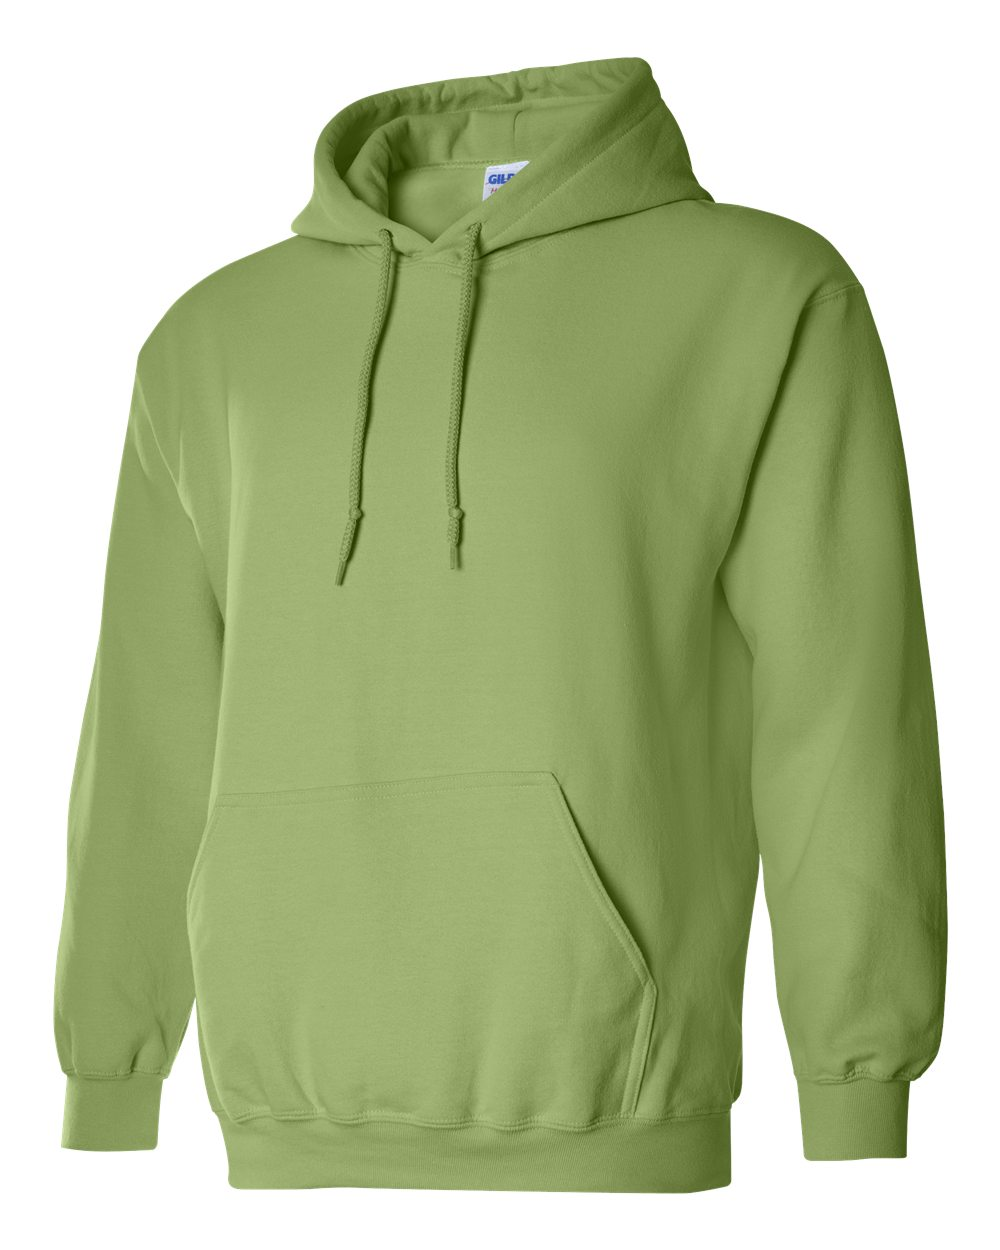 Gildan Heavy Blend Hooded Sweatshirt GI18500 Kiwi